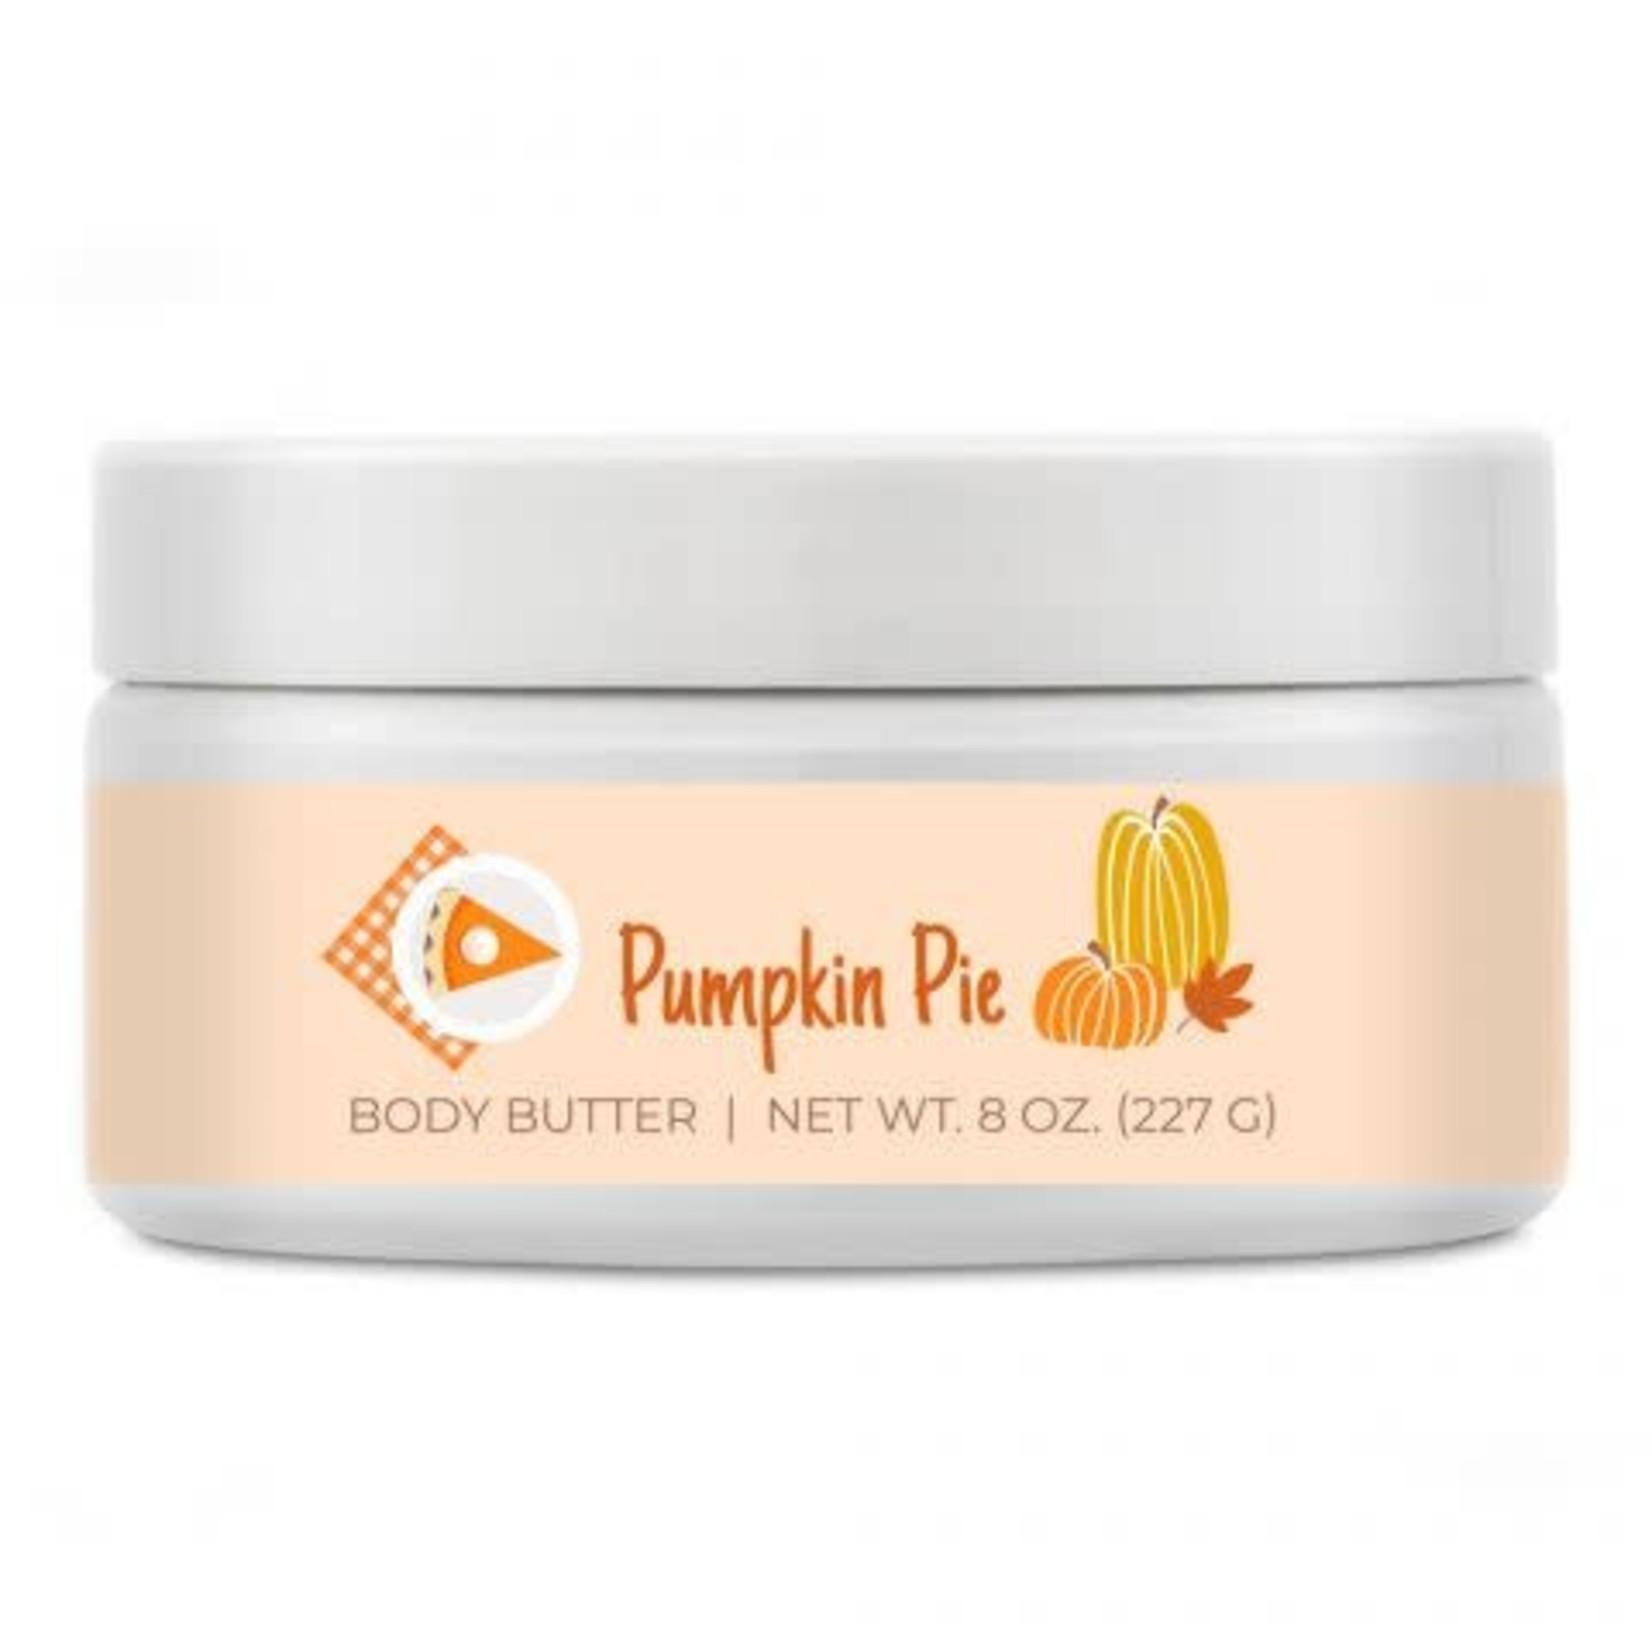 Plant Therapy PT Pumpkin Pie Body Butter 8oz